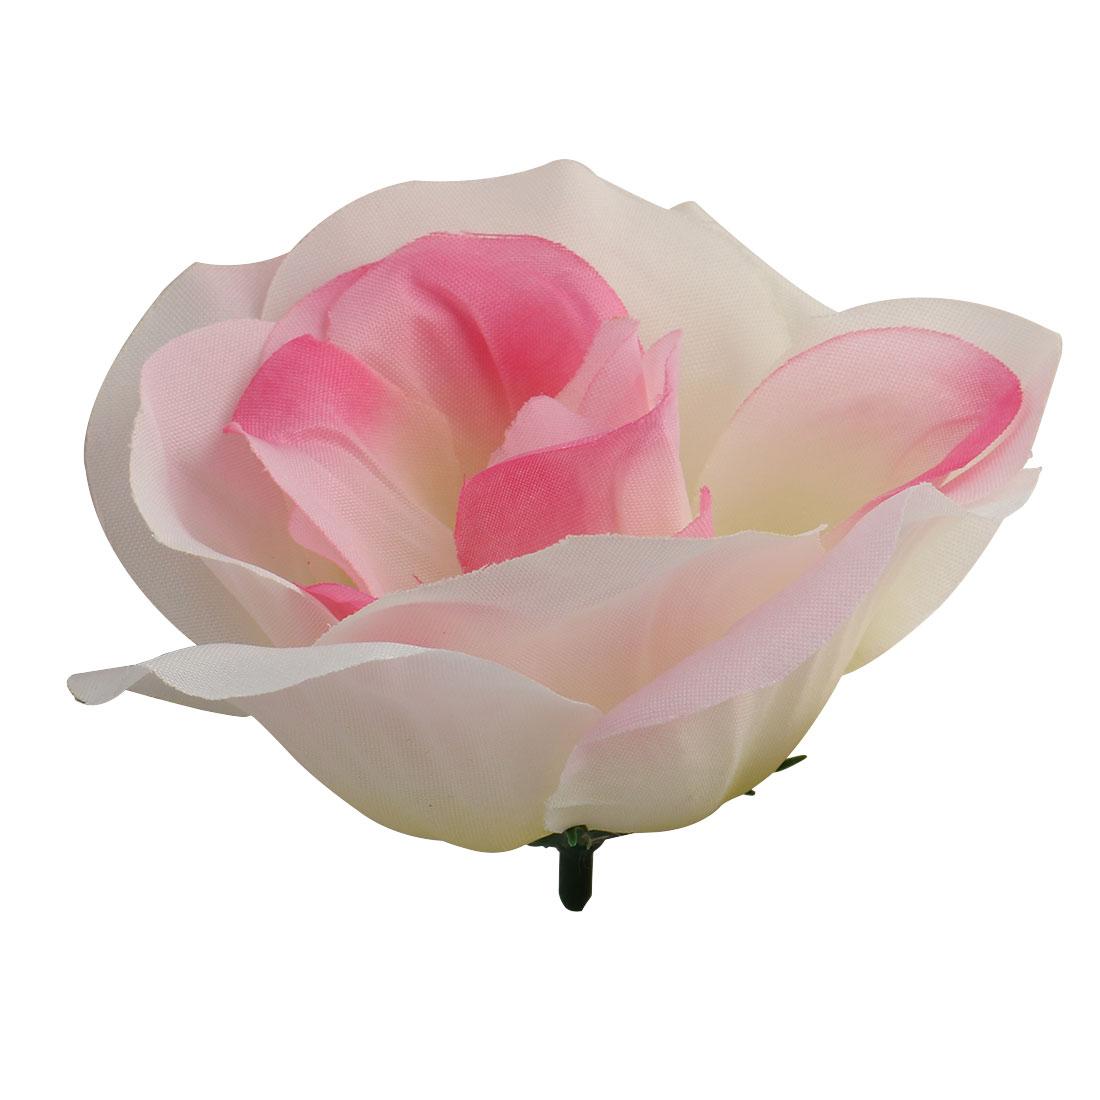 Office Bedroom Table Desk Handcraft Artificial Flower Rose Heads Decoration # 2